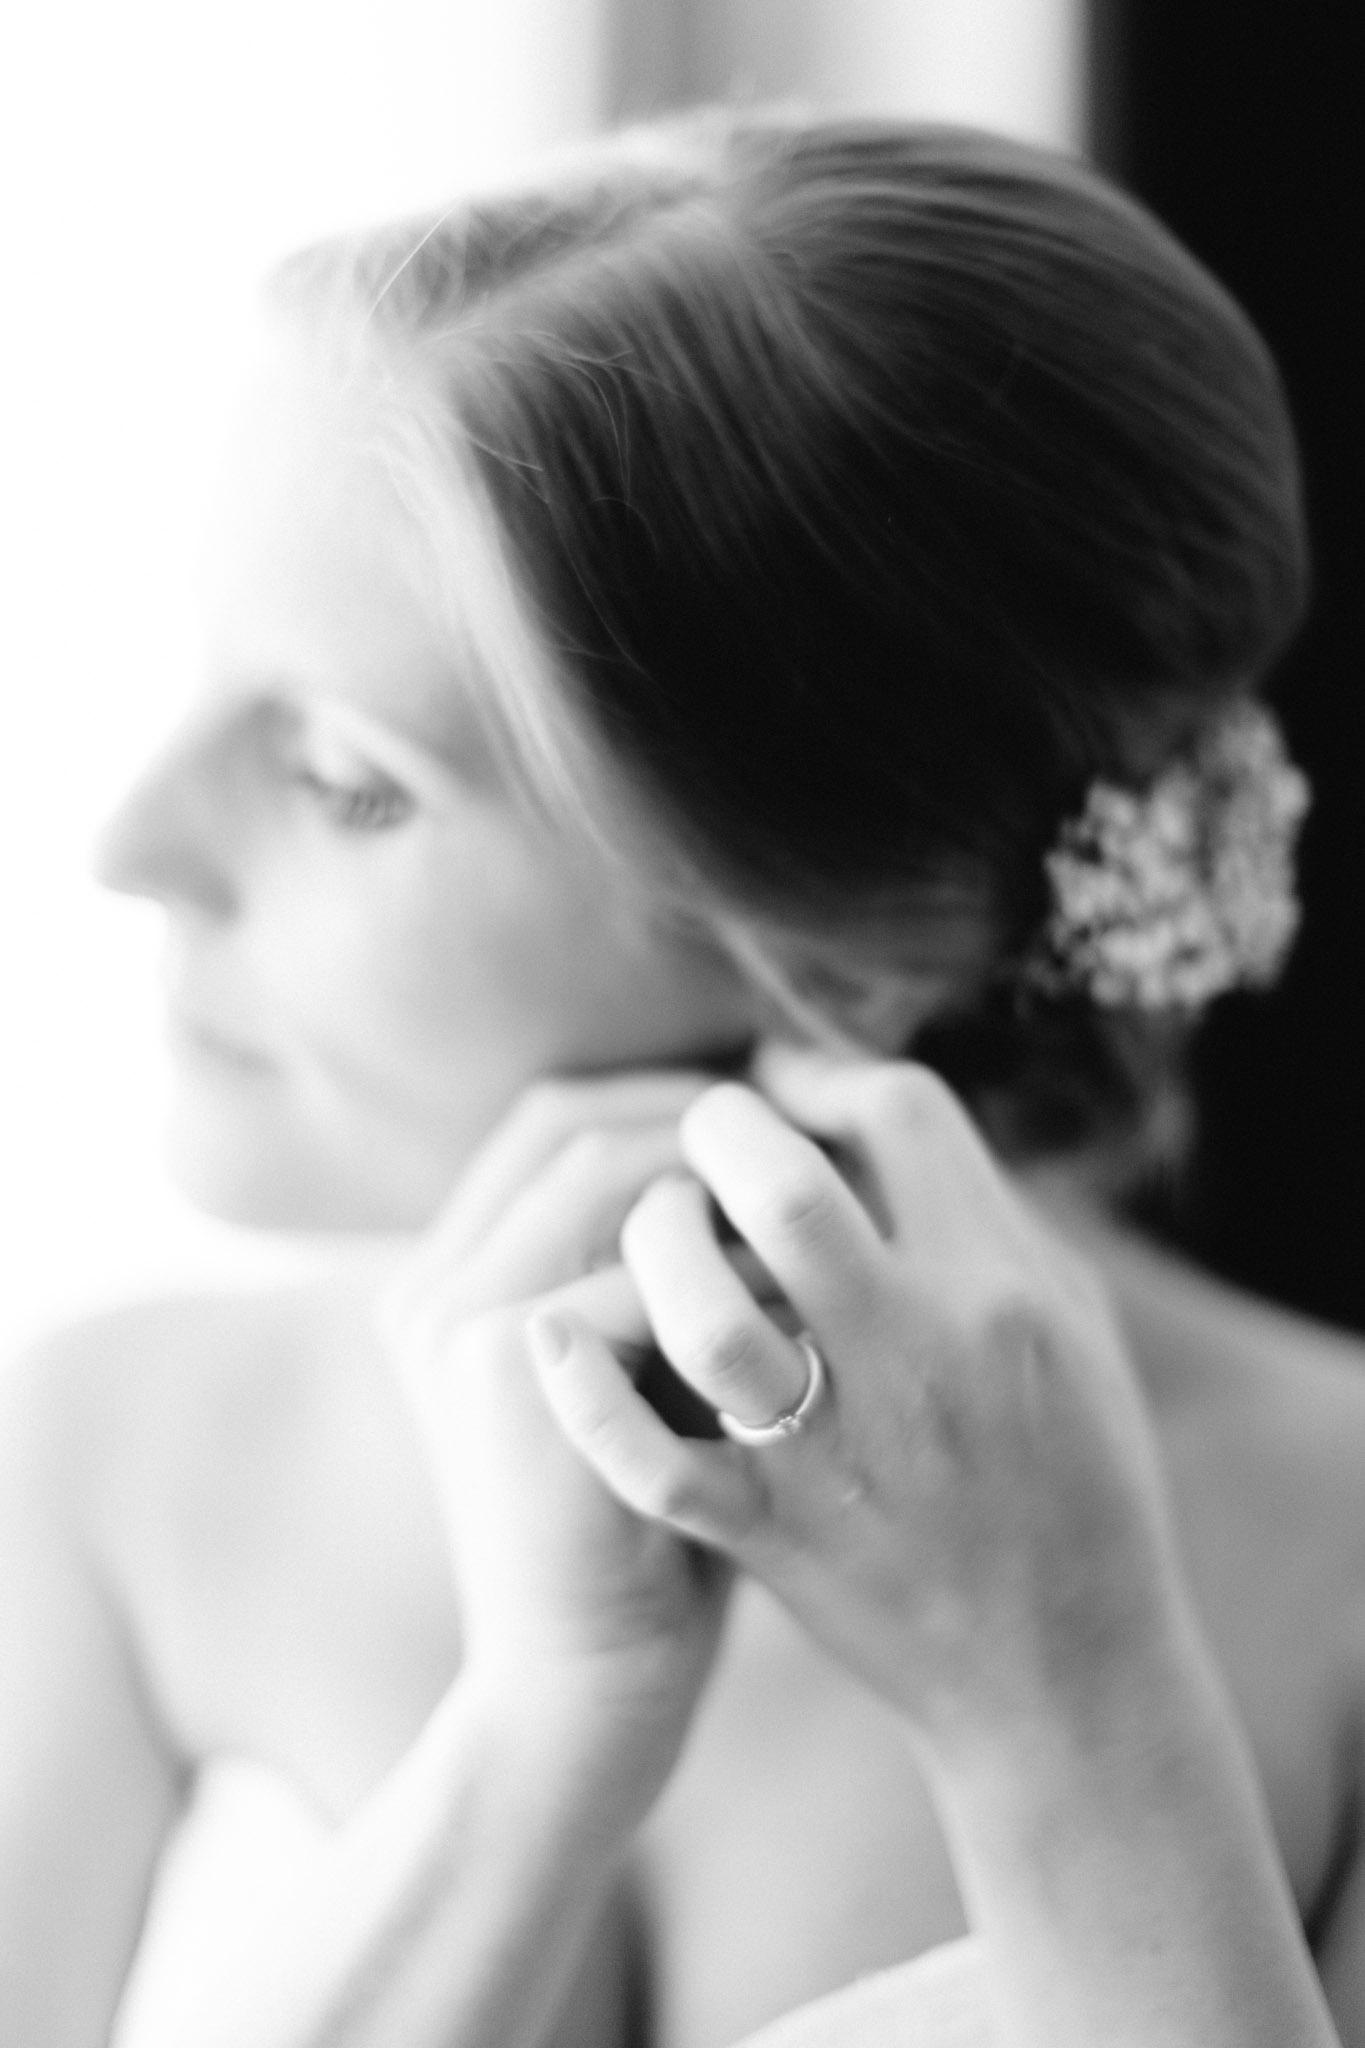 Lilienhof-Freiburg-Hochzeit-Pia-Anna-Christian-Wedding-Photography-FS-16.jpg